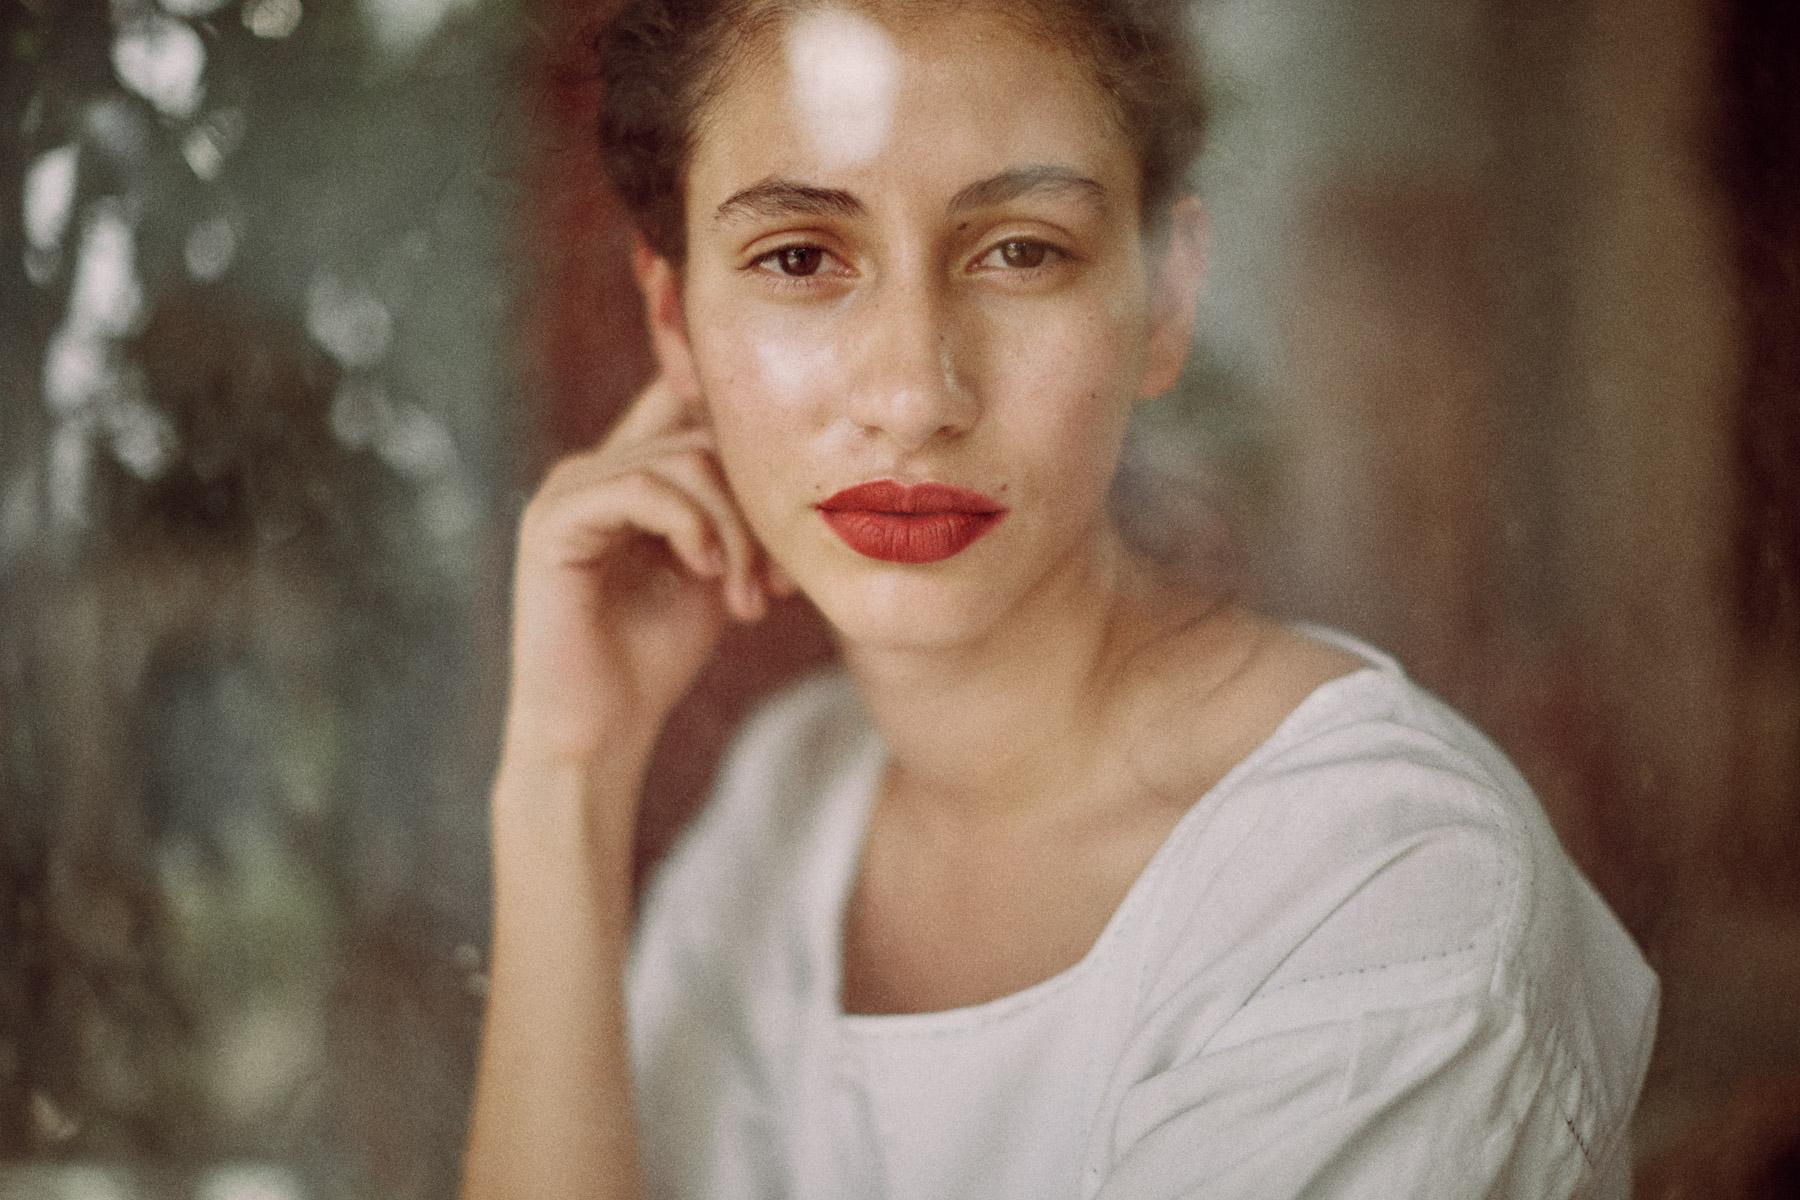 A young Mexican model in Delhi, India.